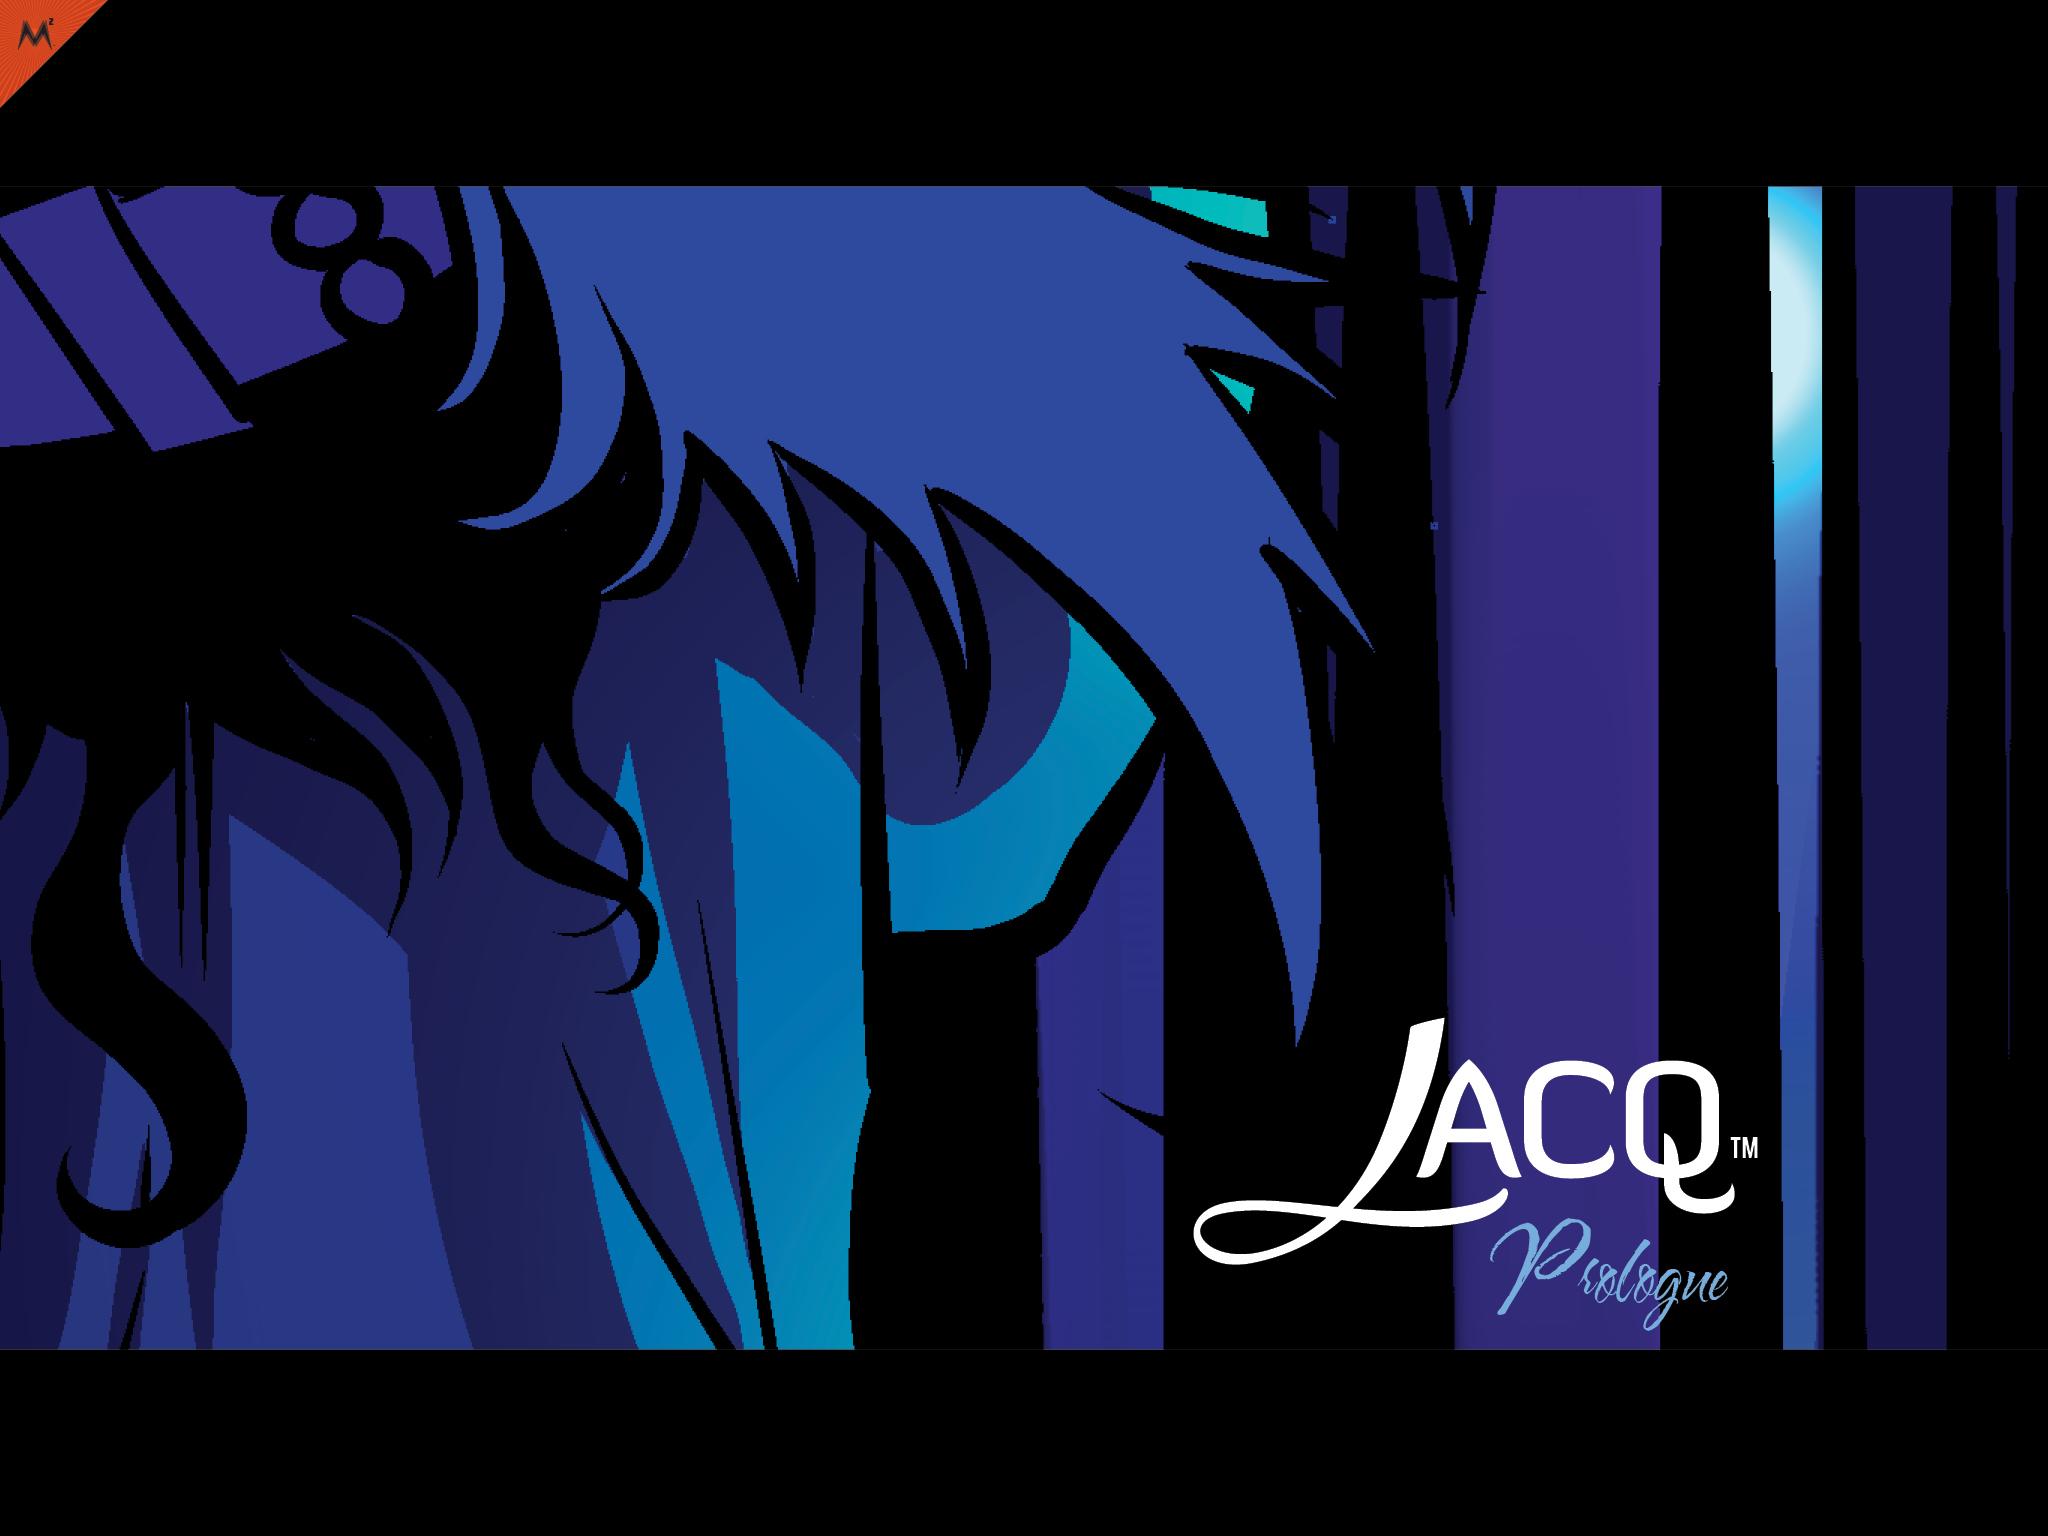 Jacq_Prologue1.jpg